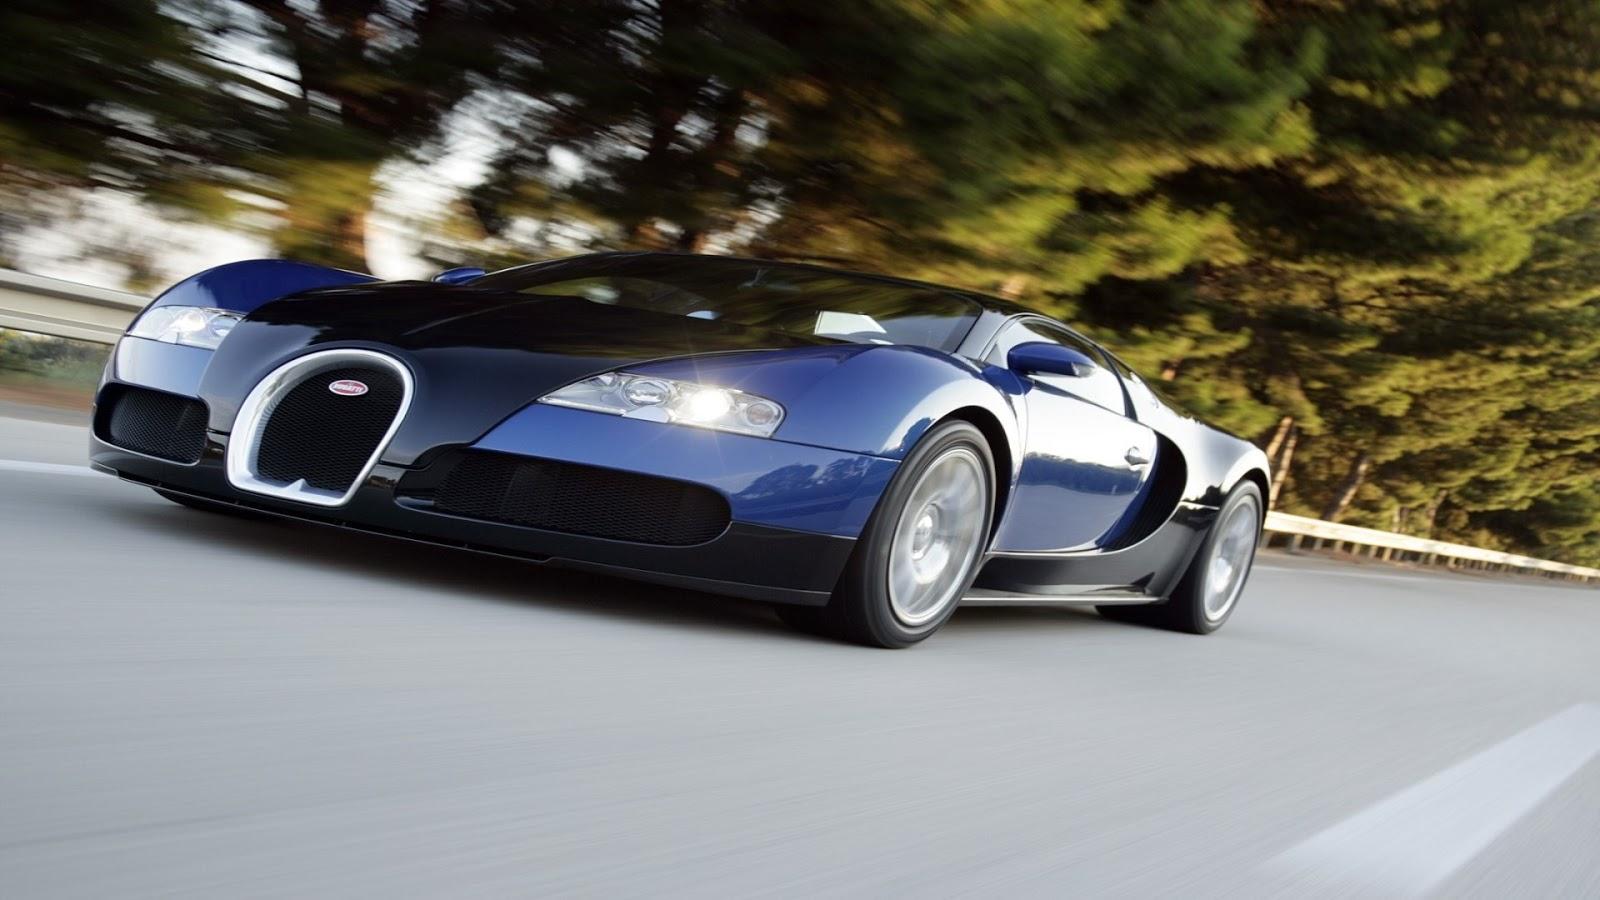 Sport Cars Wallpaper Hd 1080p: Bugatti Veyron Wallpaper 1080p